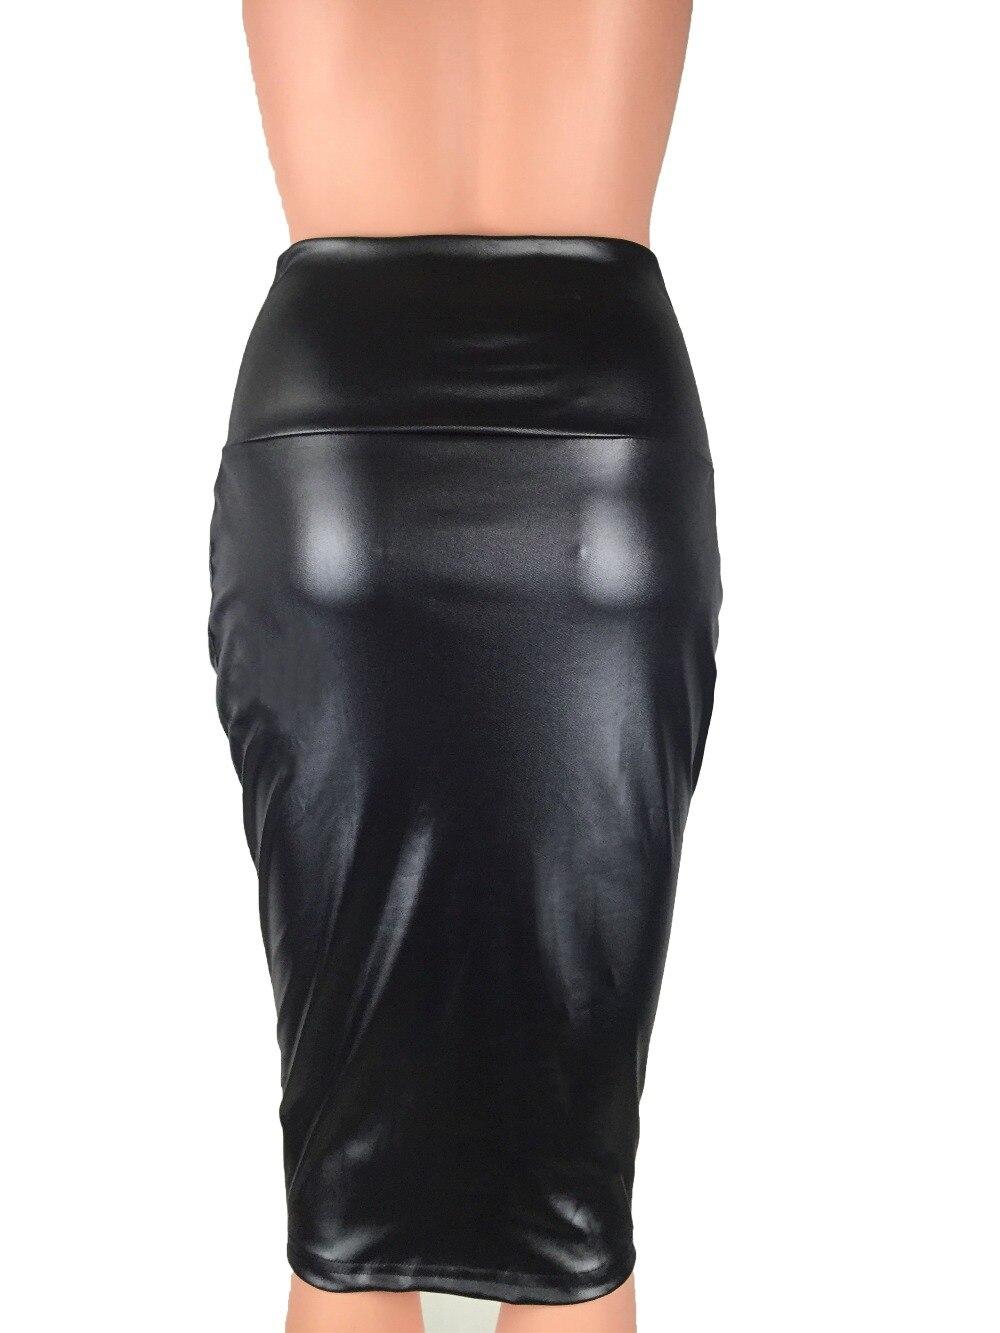 Bohocotol 2018 μολύβι faux δερμάτινη φούστα - Γυναικείος ρουχισμός - Φωτογραφία 5